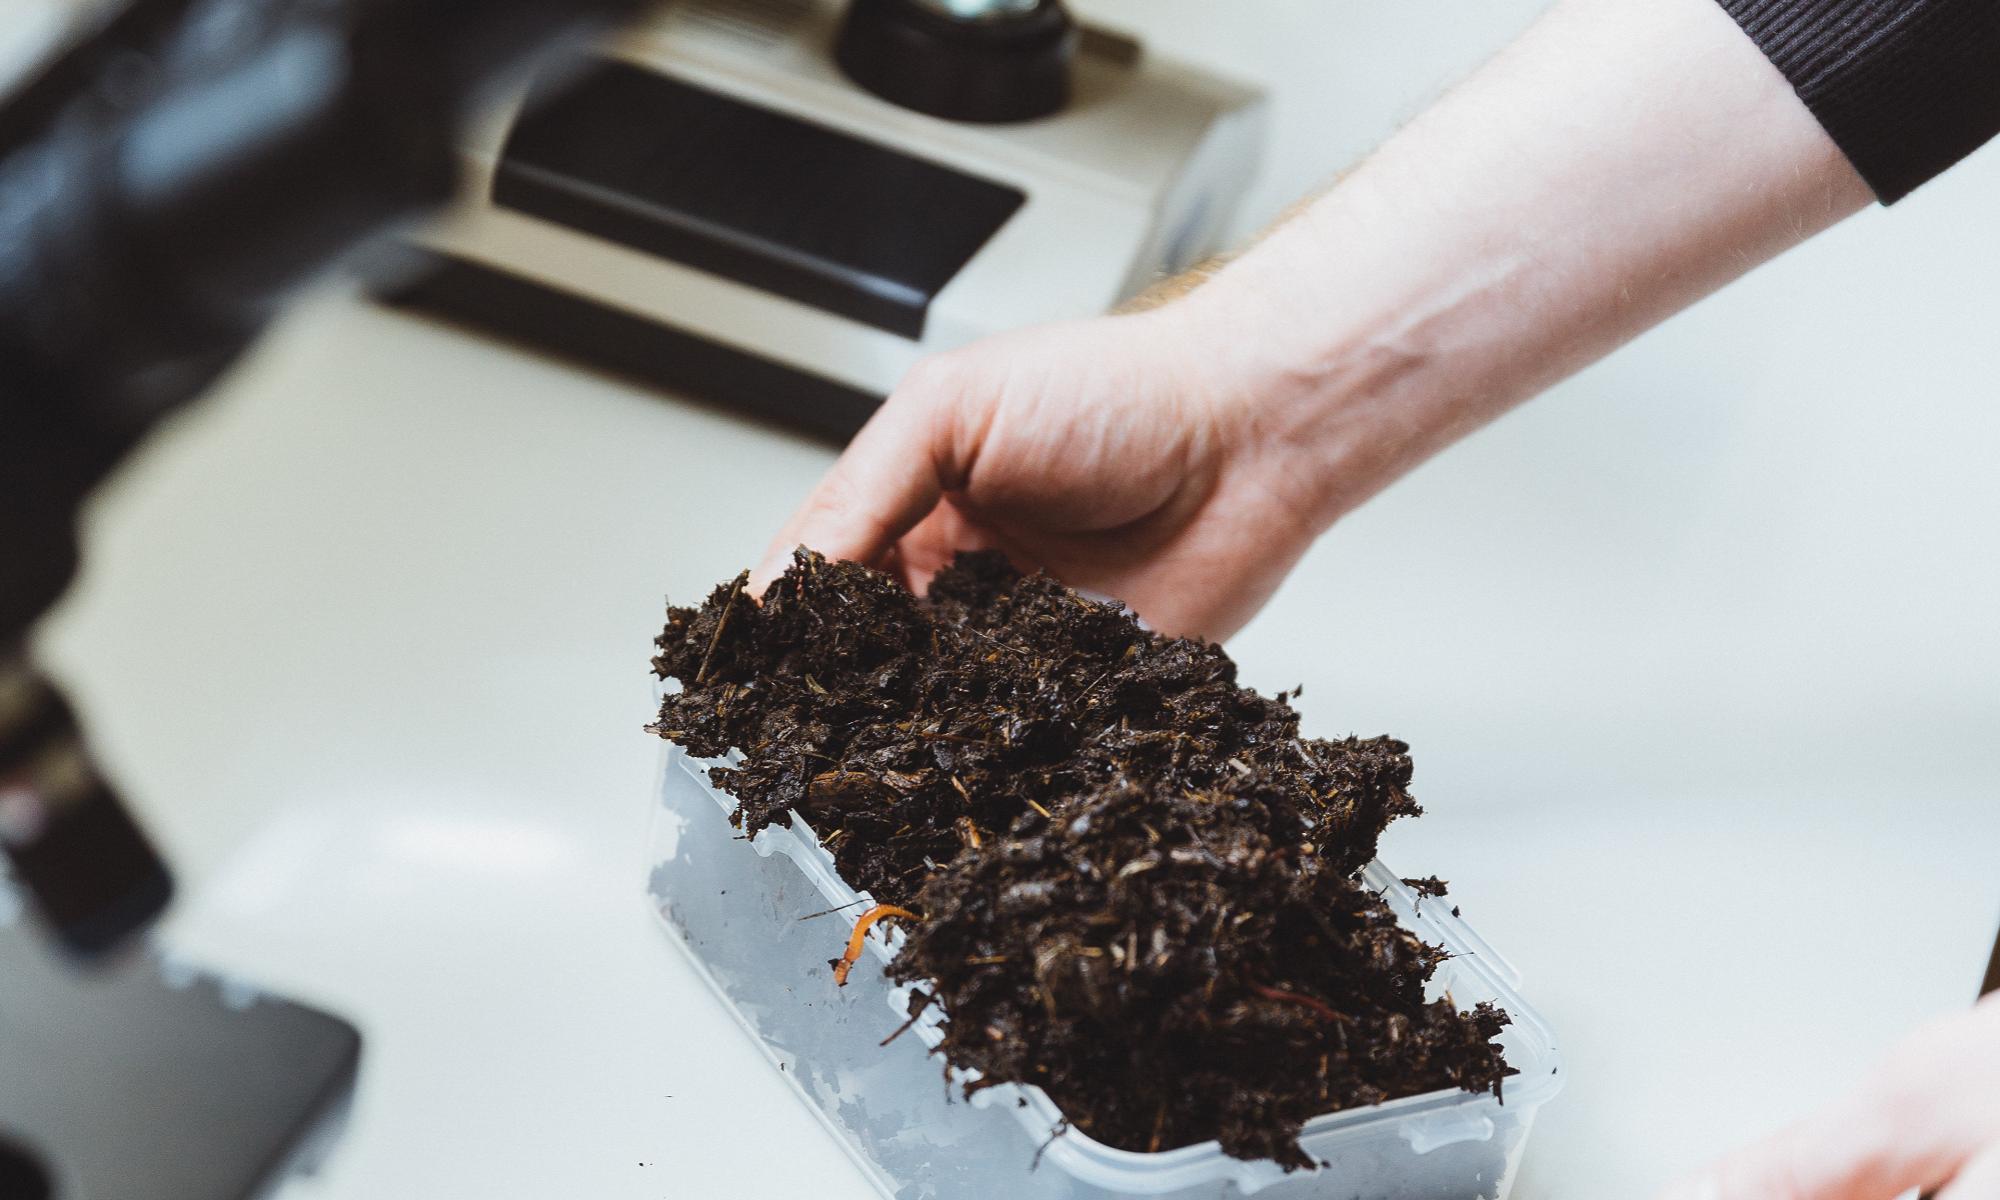 Soil Ecology Laboratory